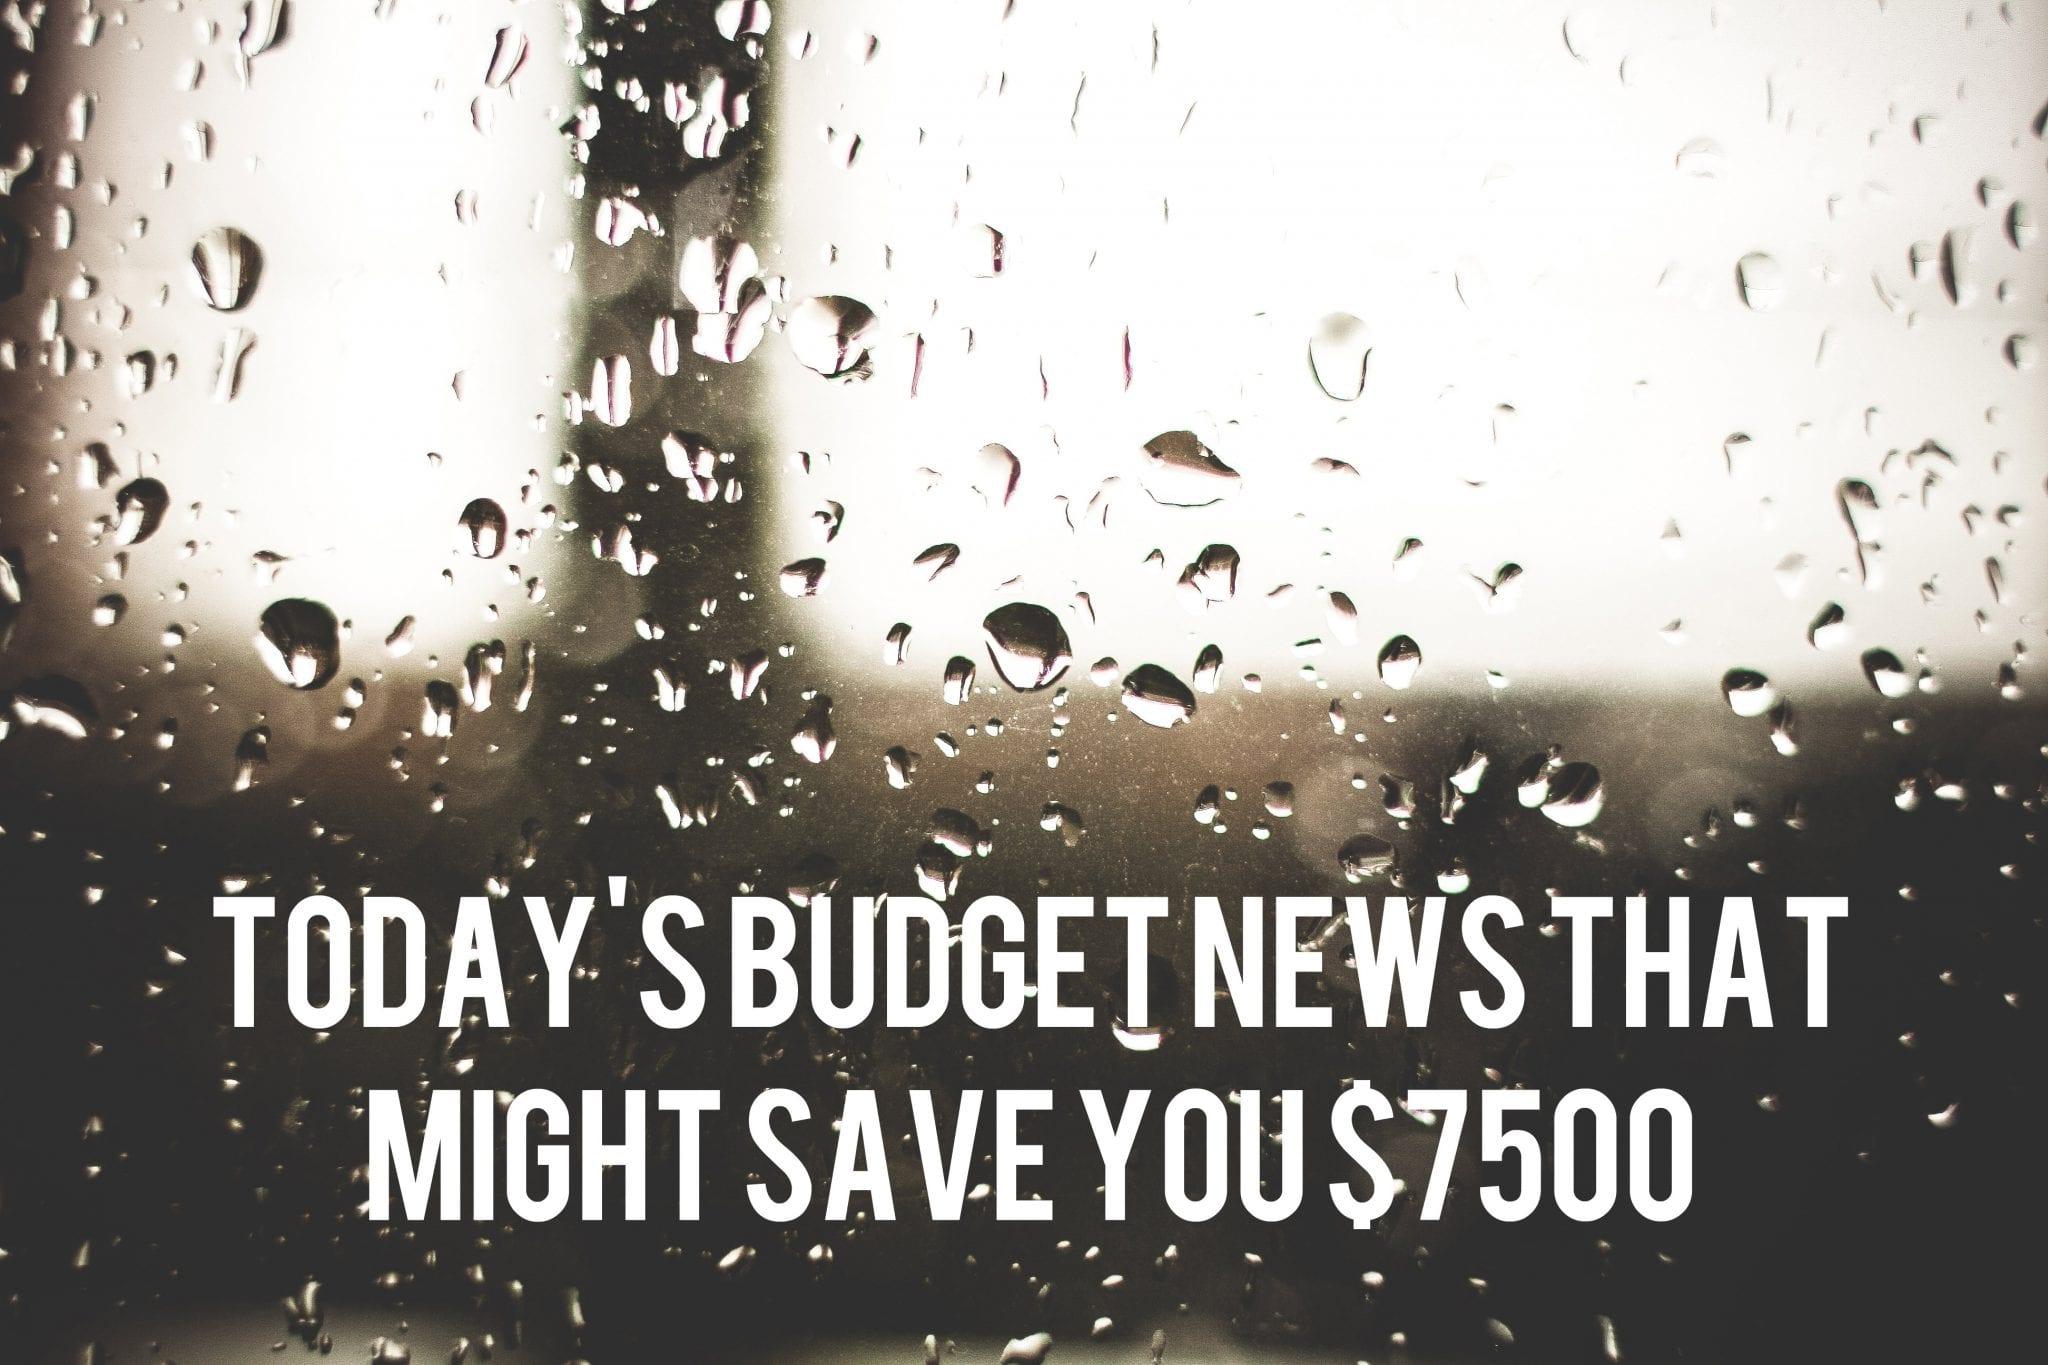 2014 BC budget savings